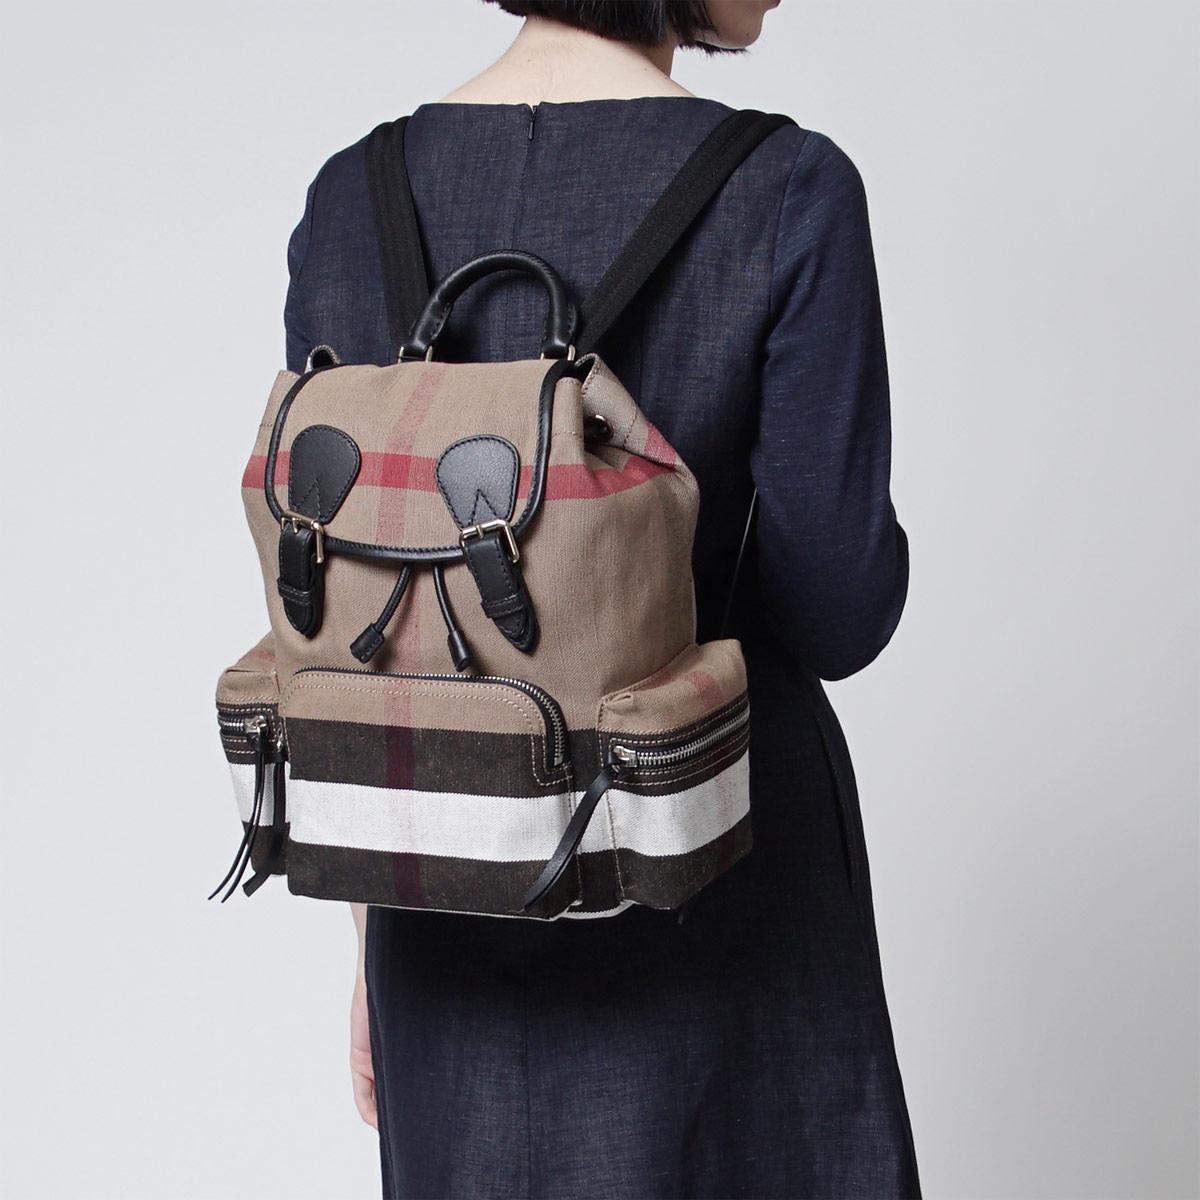 Burberry BURBERRY backpack rucksack MEDIUM BLACK black system 4030201 black Lady's